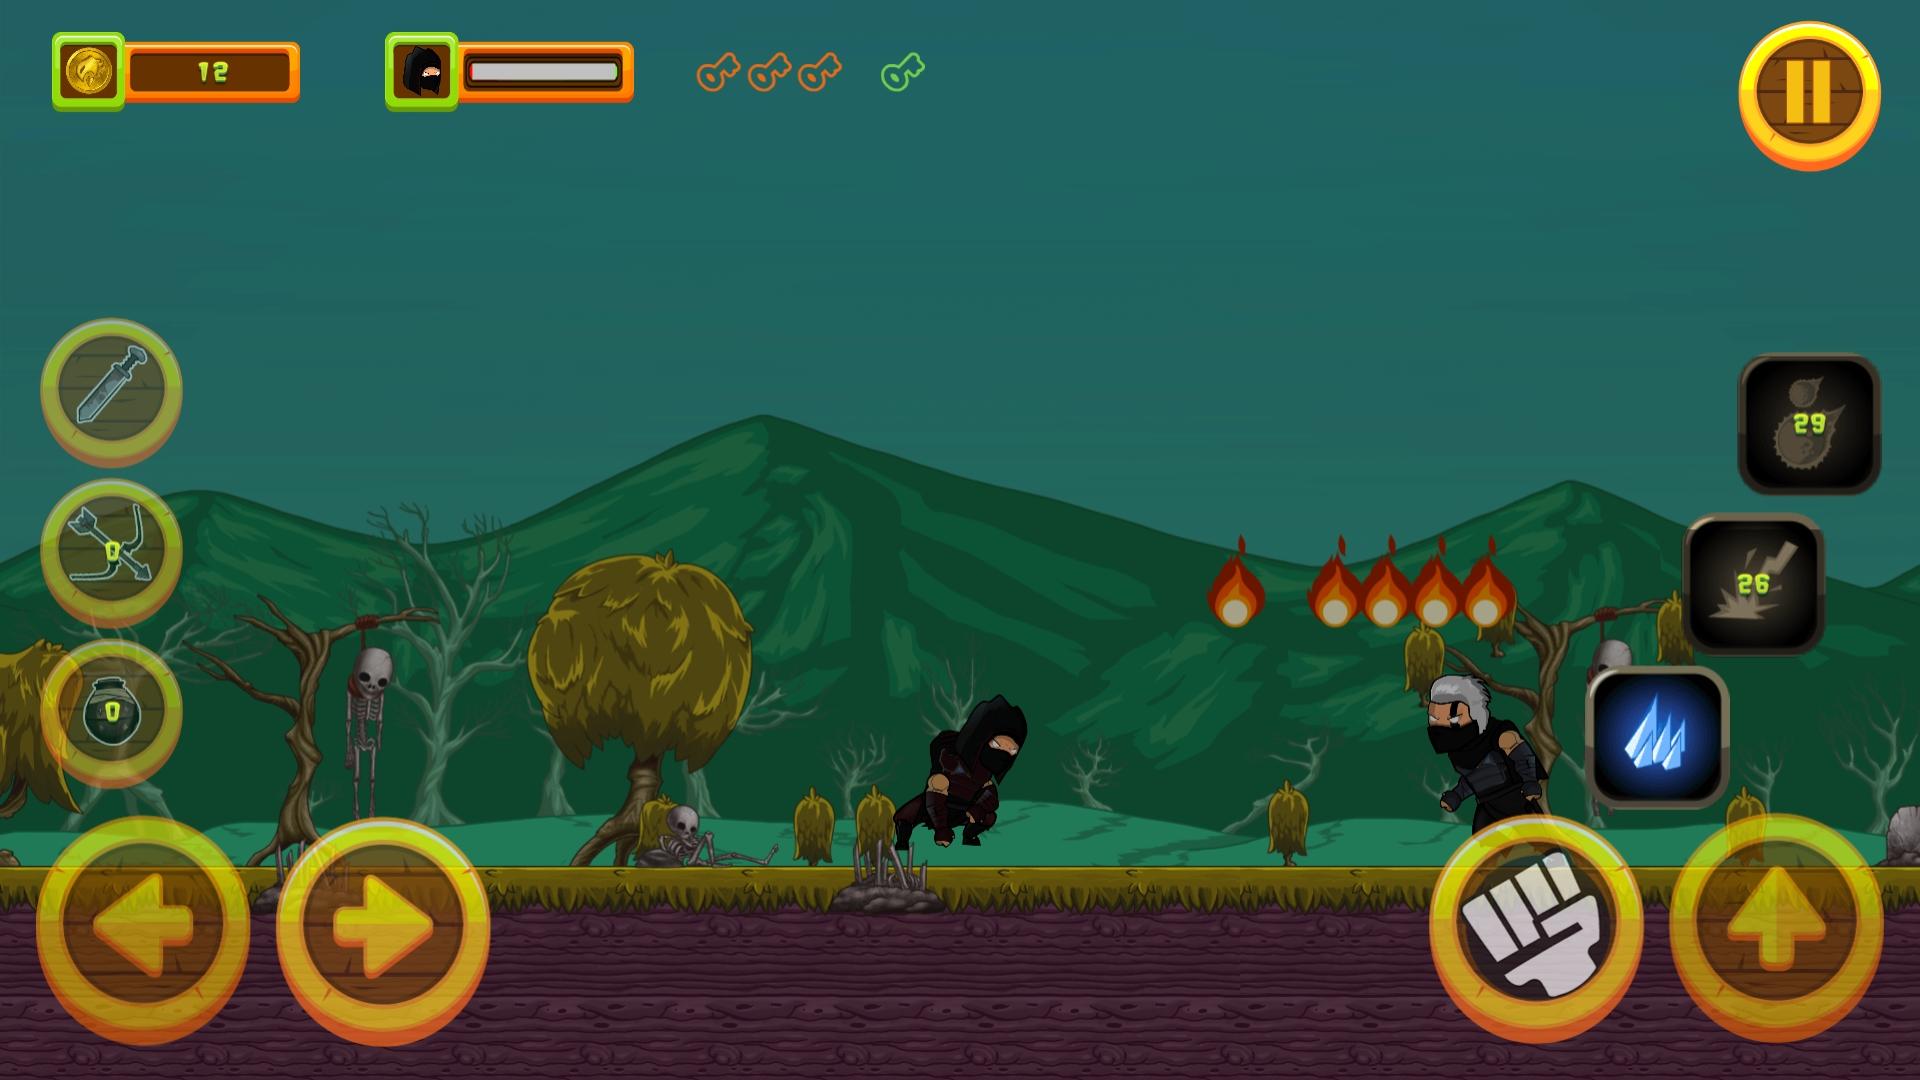 Black Assassin - HTML5 Game + Mobile Version (Construct 3 / C3P) - 7